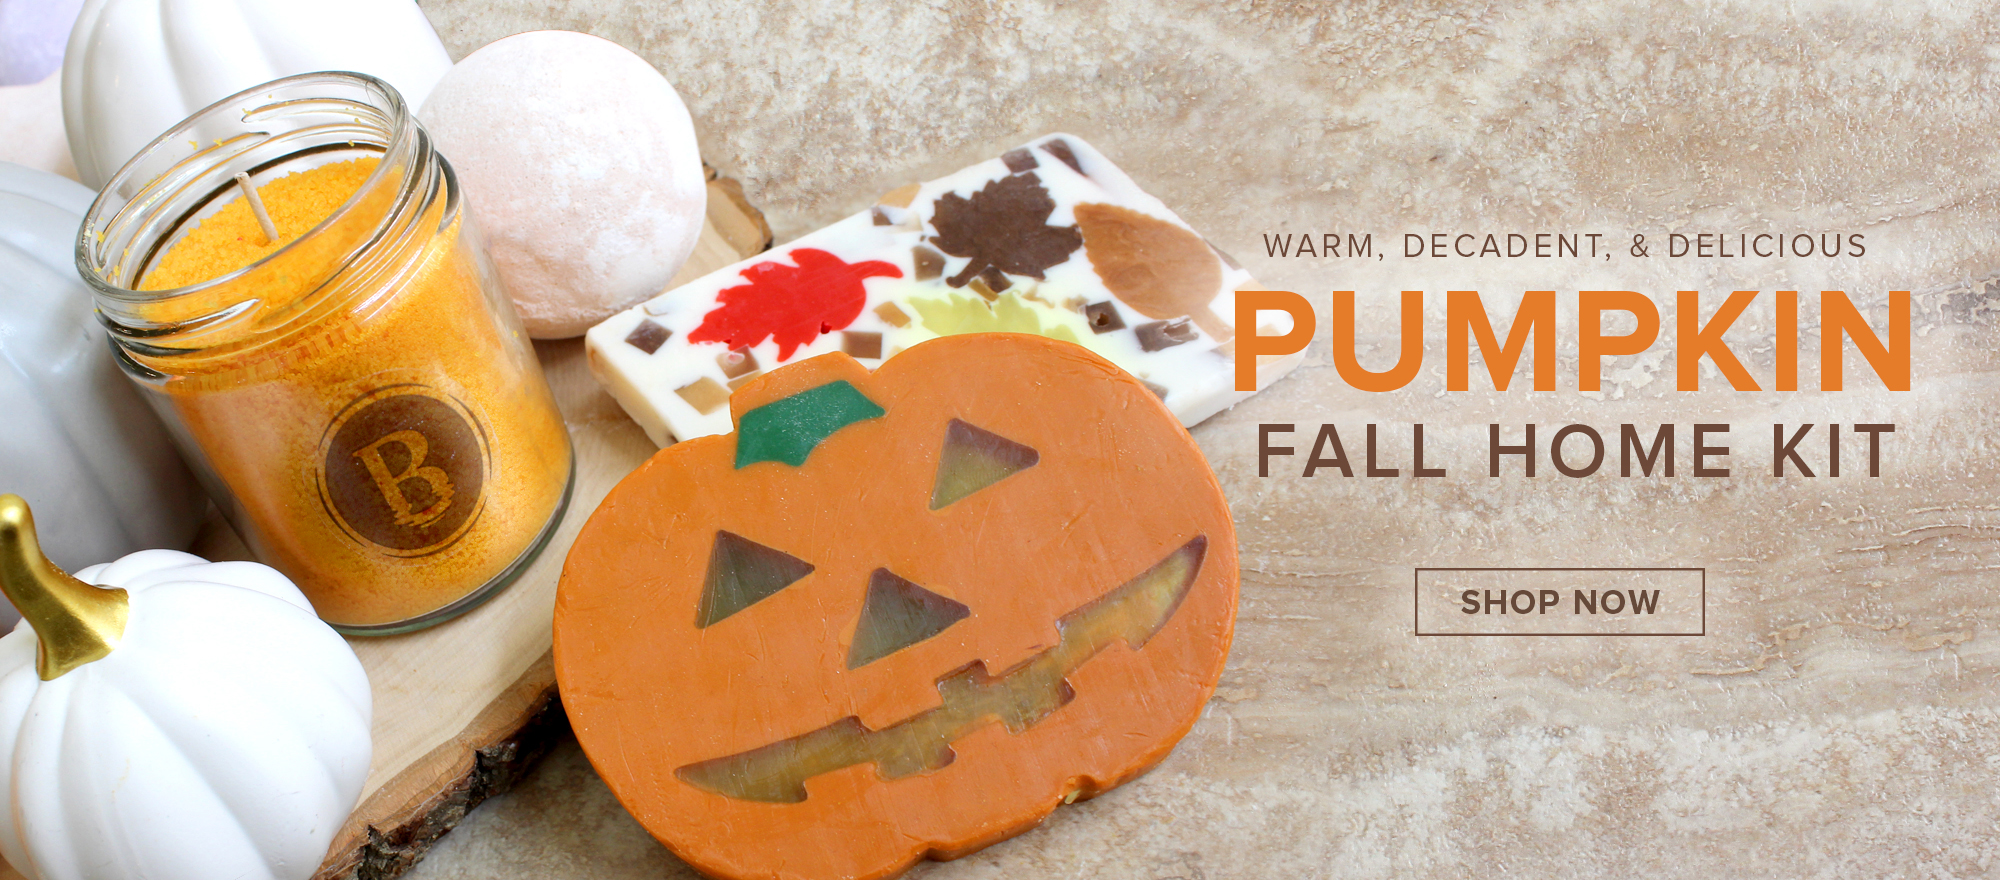 Pumpkin Fall Home Kit